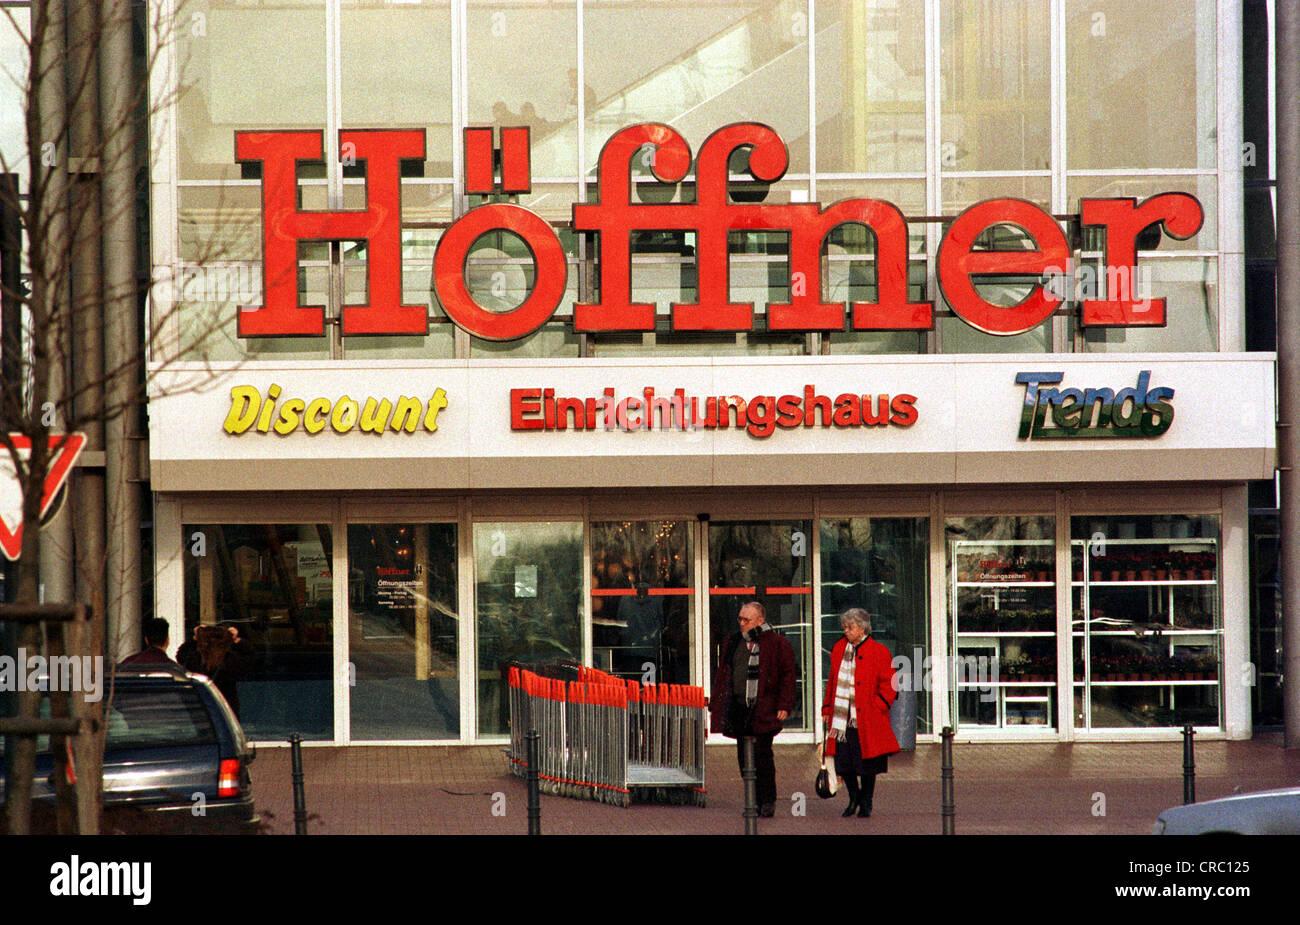 Furniture Store Hoeffner Stock Photos Furniture Store Hoeffner